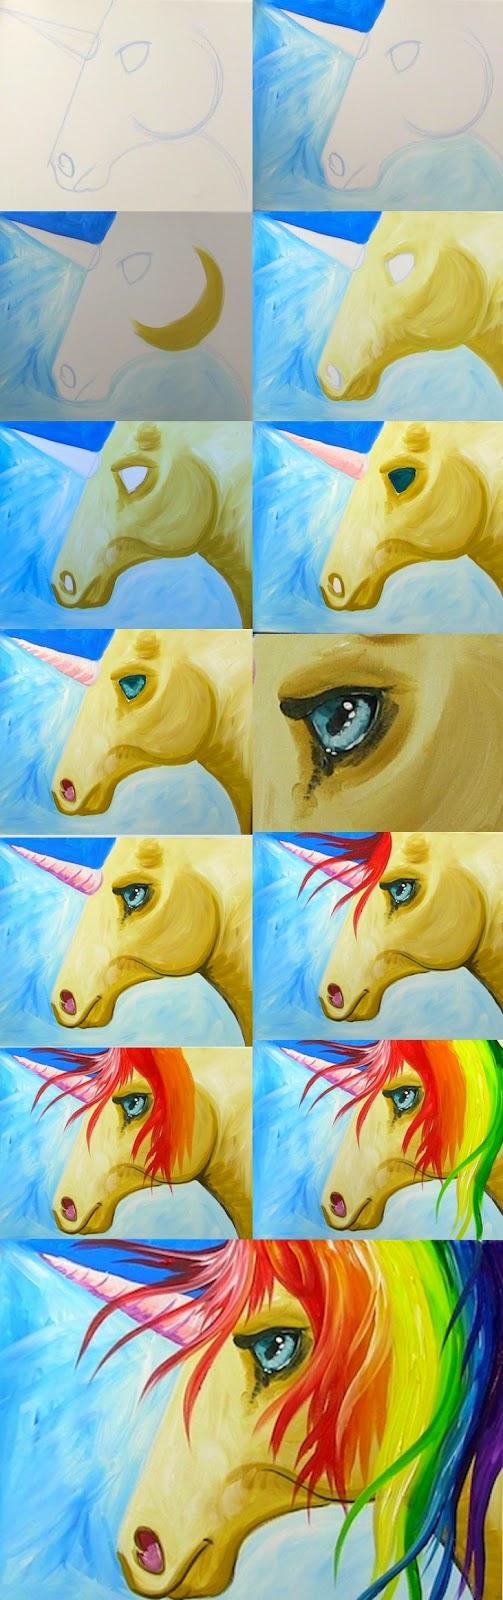 Etapes de dessin de la licorne.